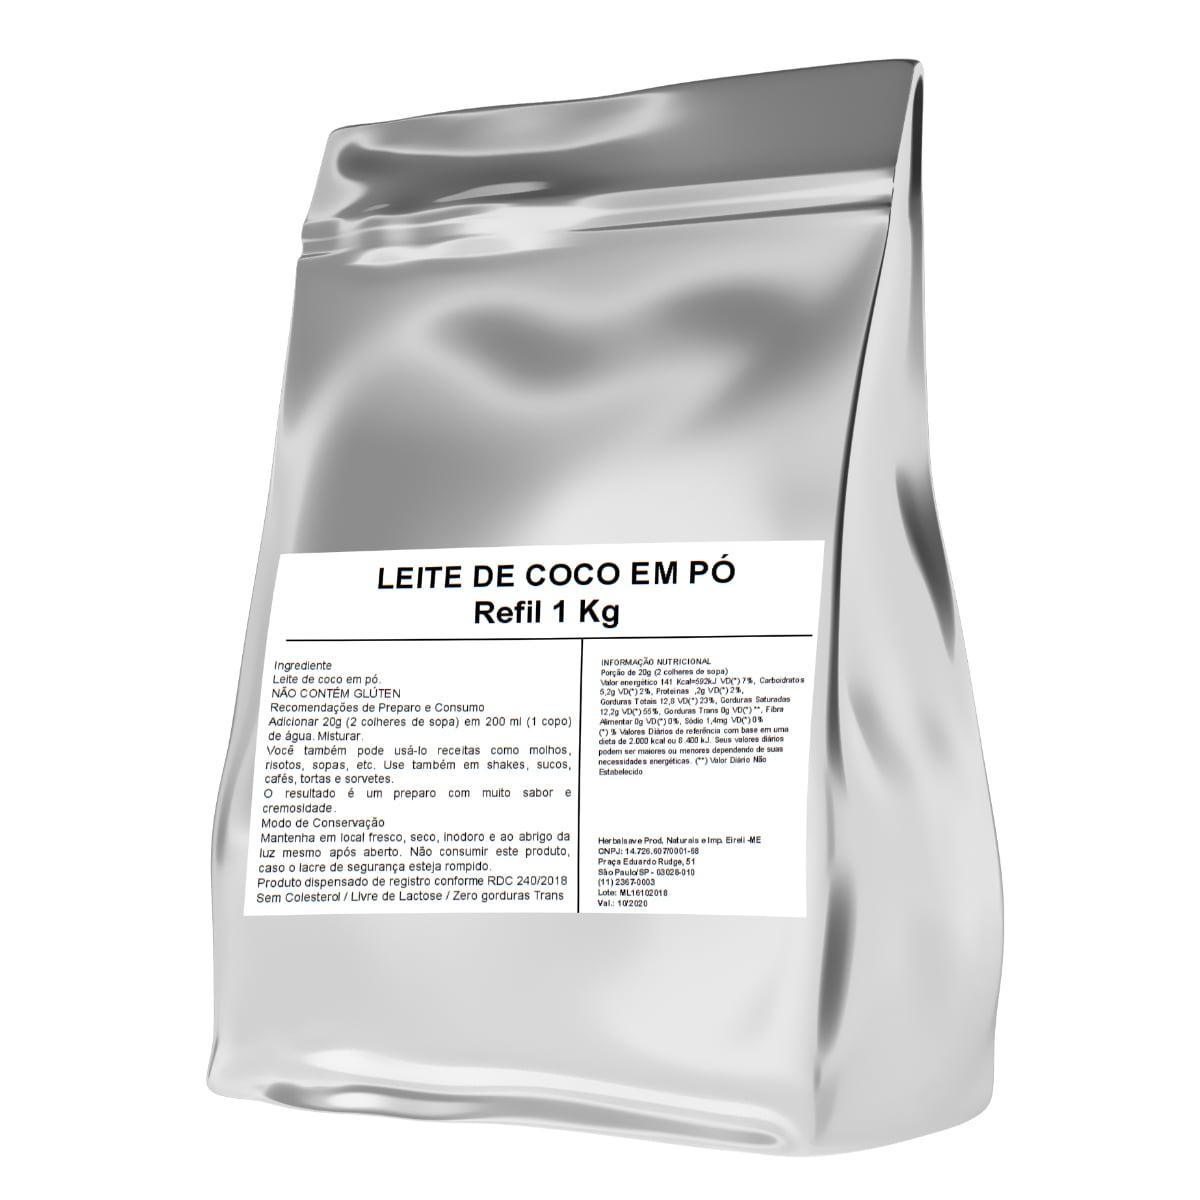 Leite de Coco Puro 1Kg 1 Kilo Quilo Po WVegan